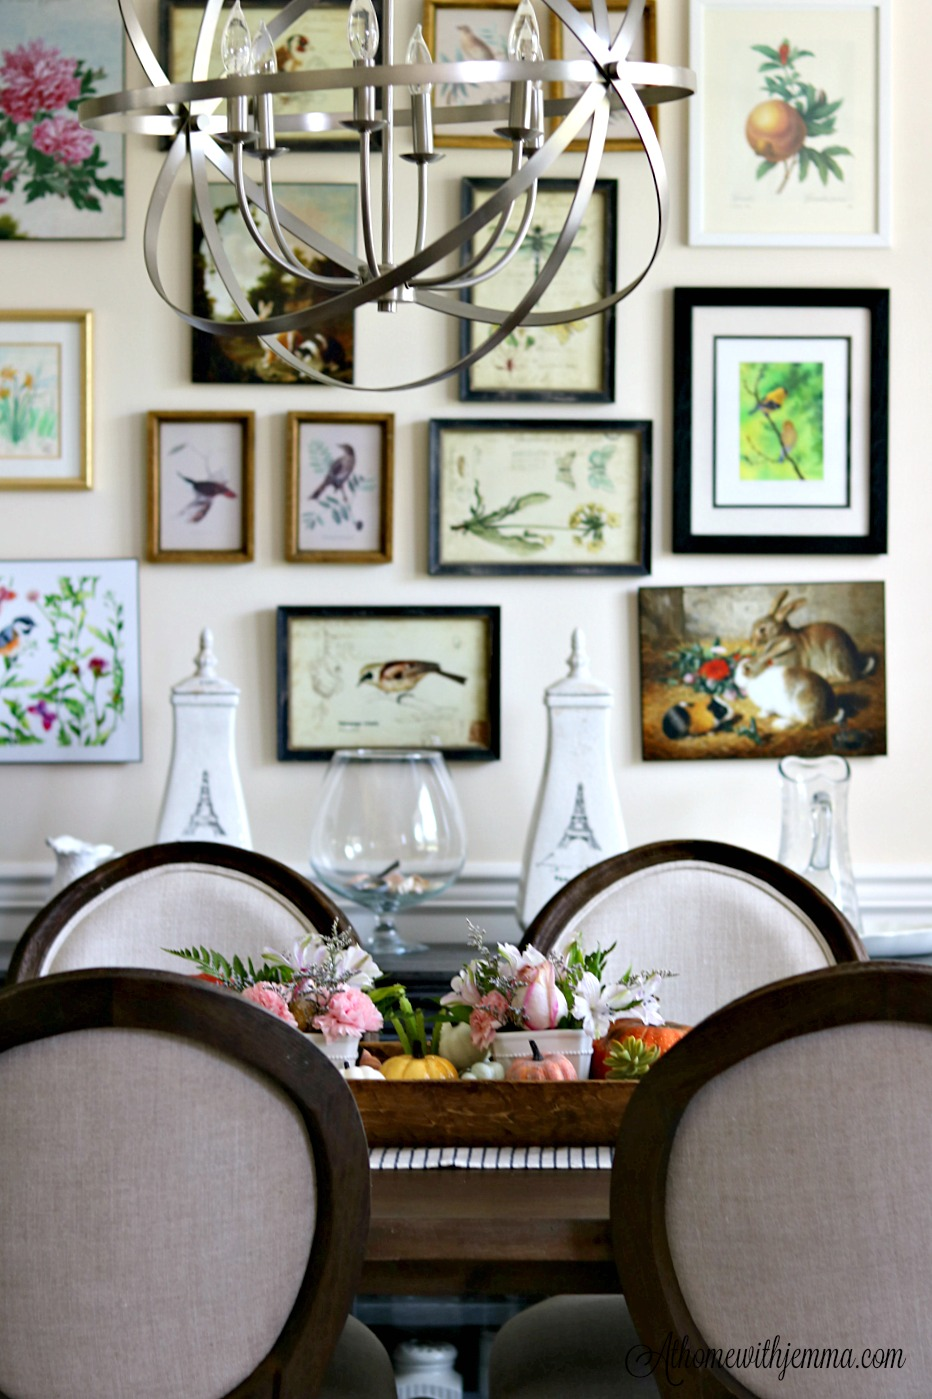 french, florida, decorating, styling, farmhouse, fall, decor, pumpkins, dough, bowl athomewithjemma.com